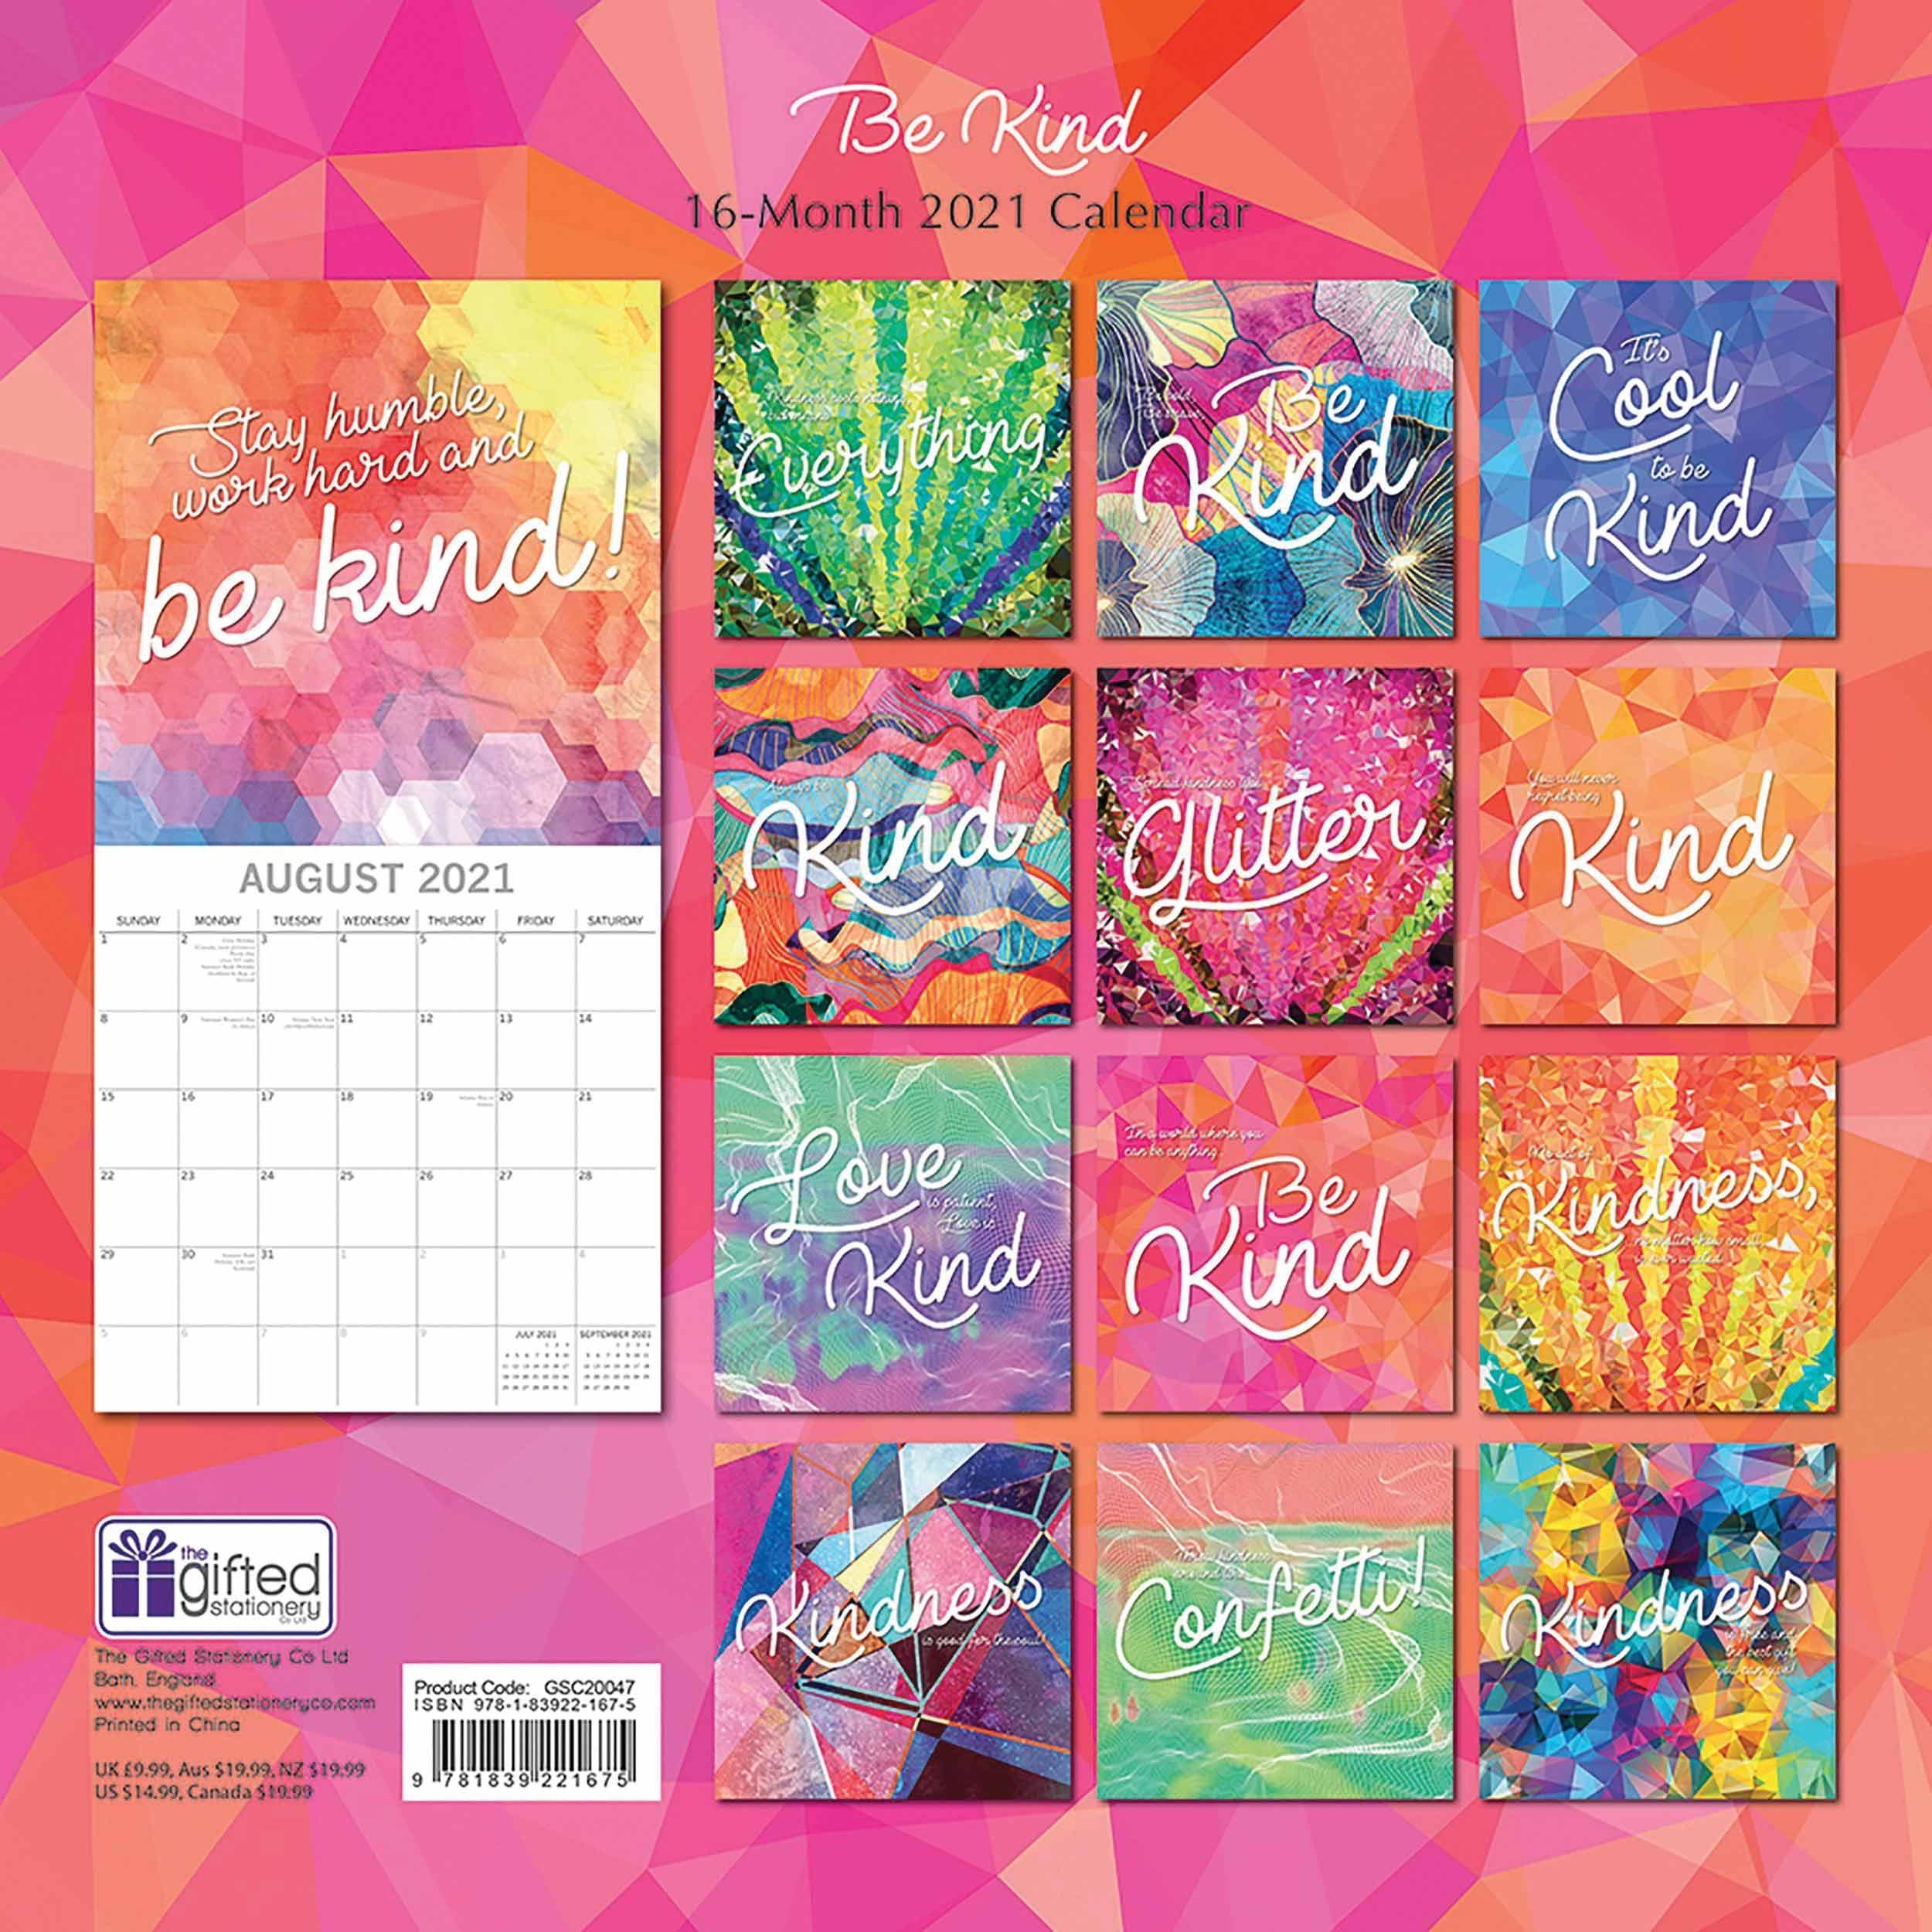 Be Kind Calendar 2021 At Calendar Club